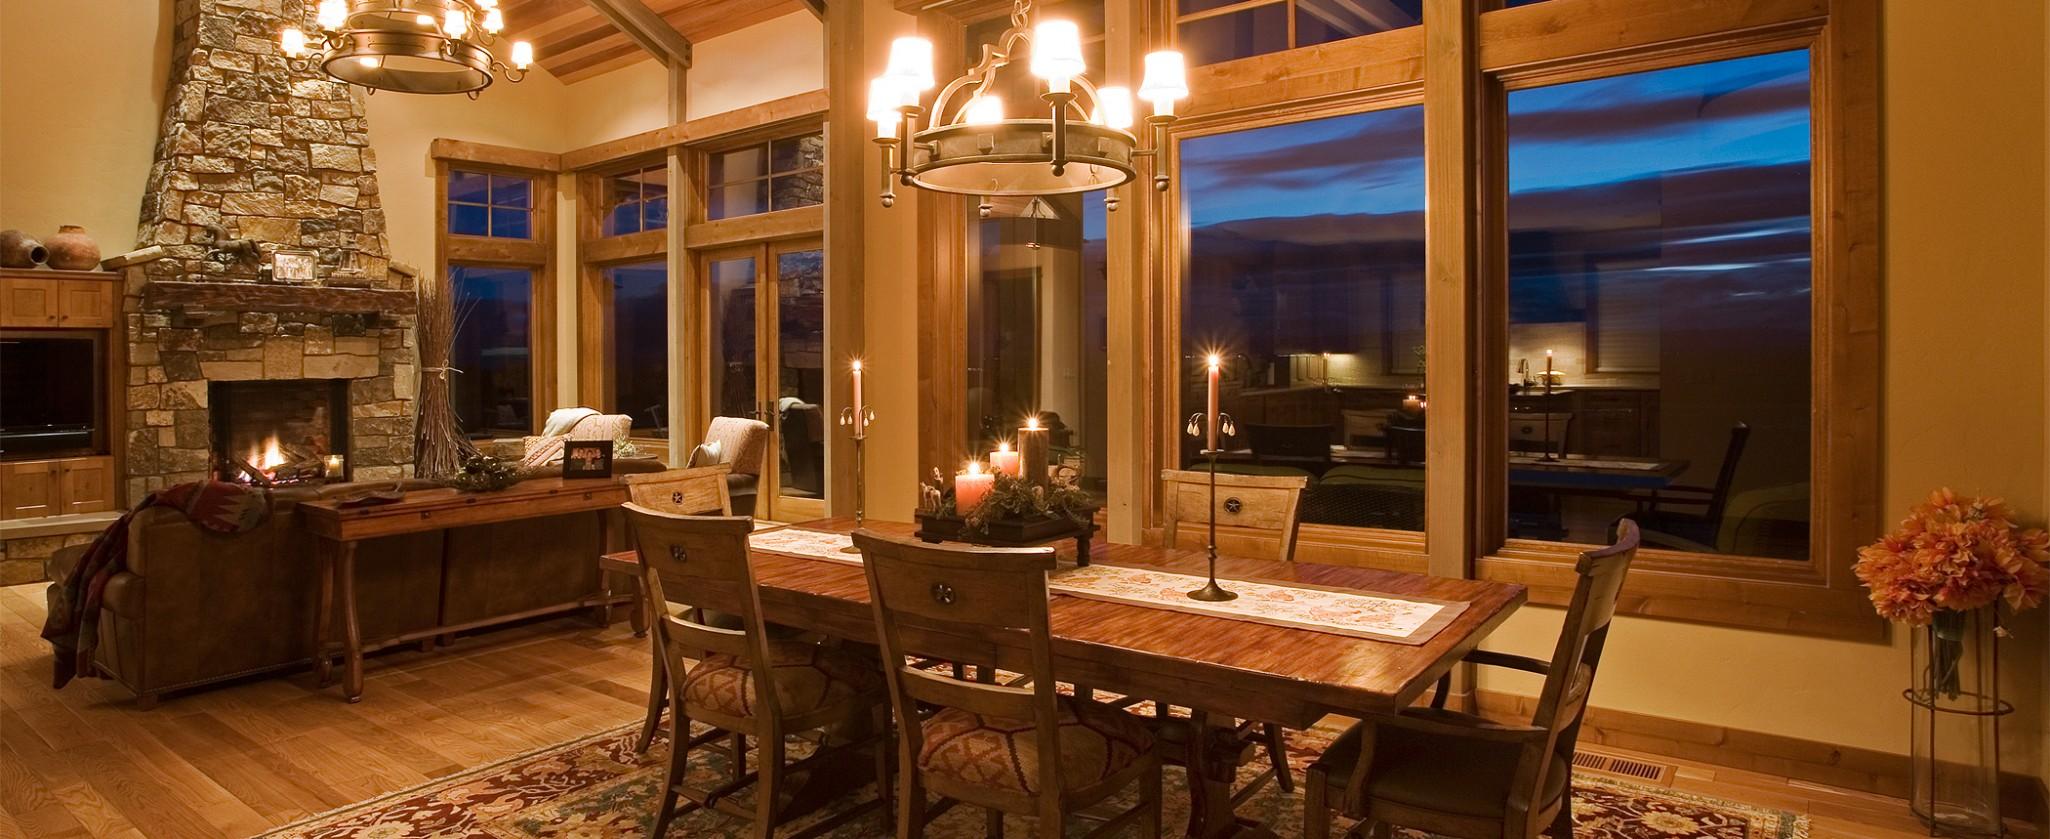 Complements Home Interiors Bend Oregon Interior Designers